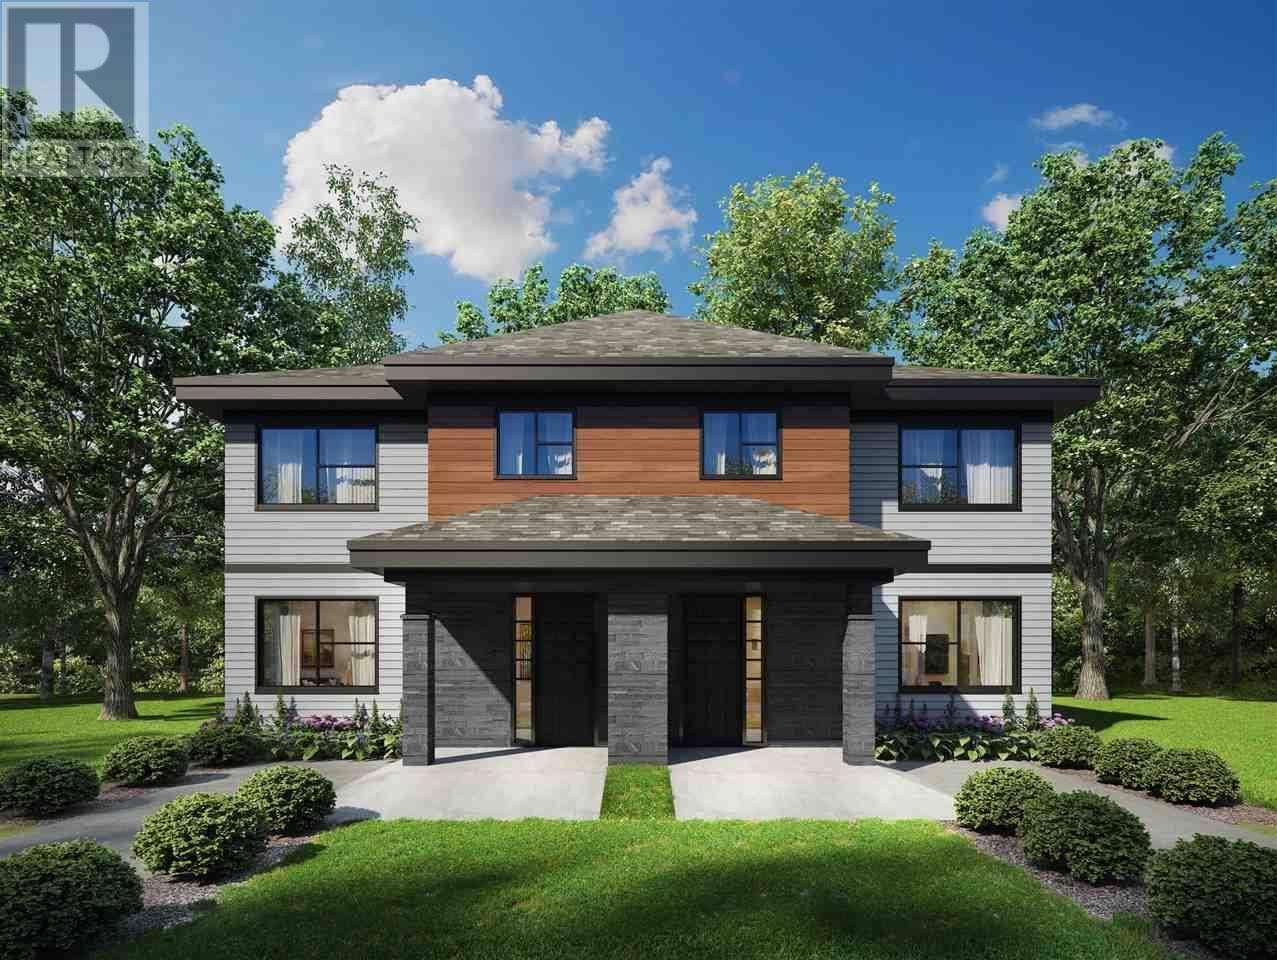 House for sale at 762 Herring Cove Rd Unit A Herring Cove Nova Scotia - MLS: 201919222